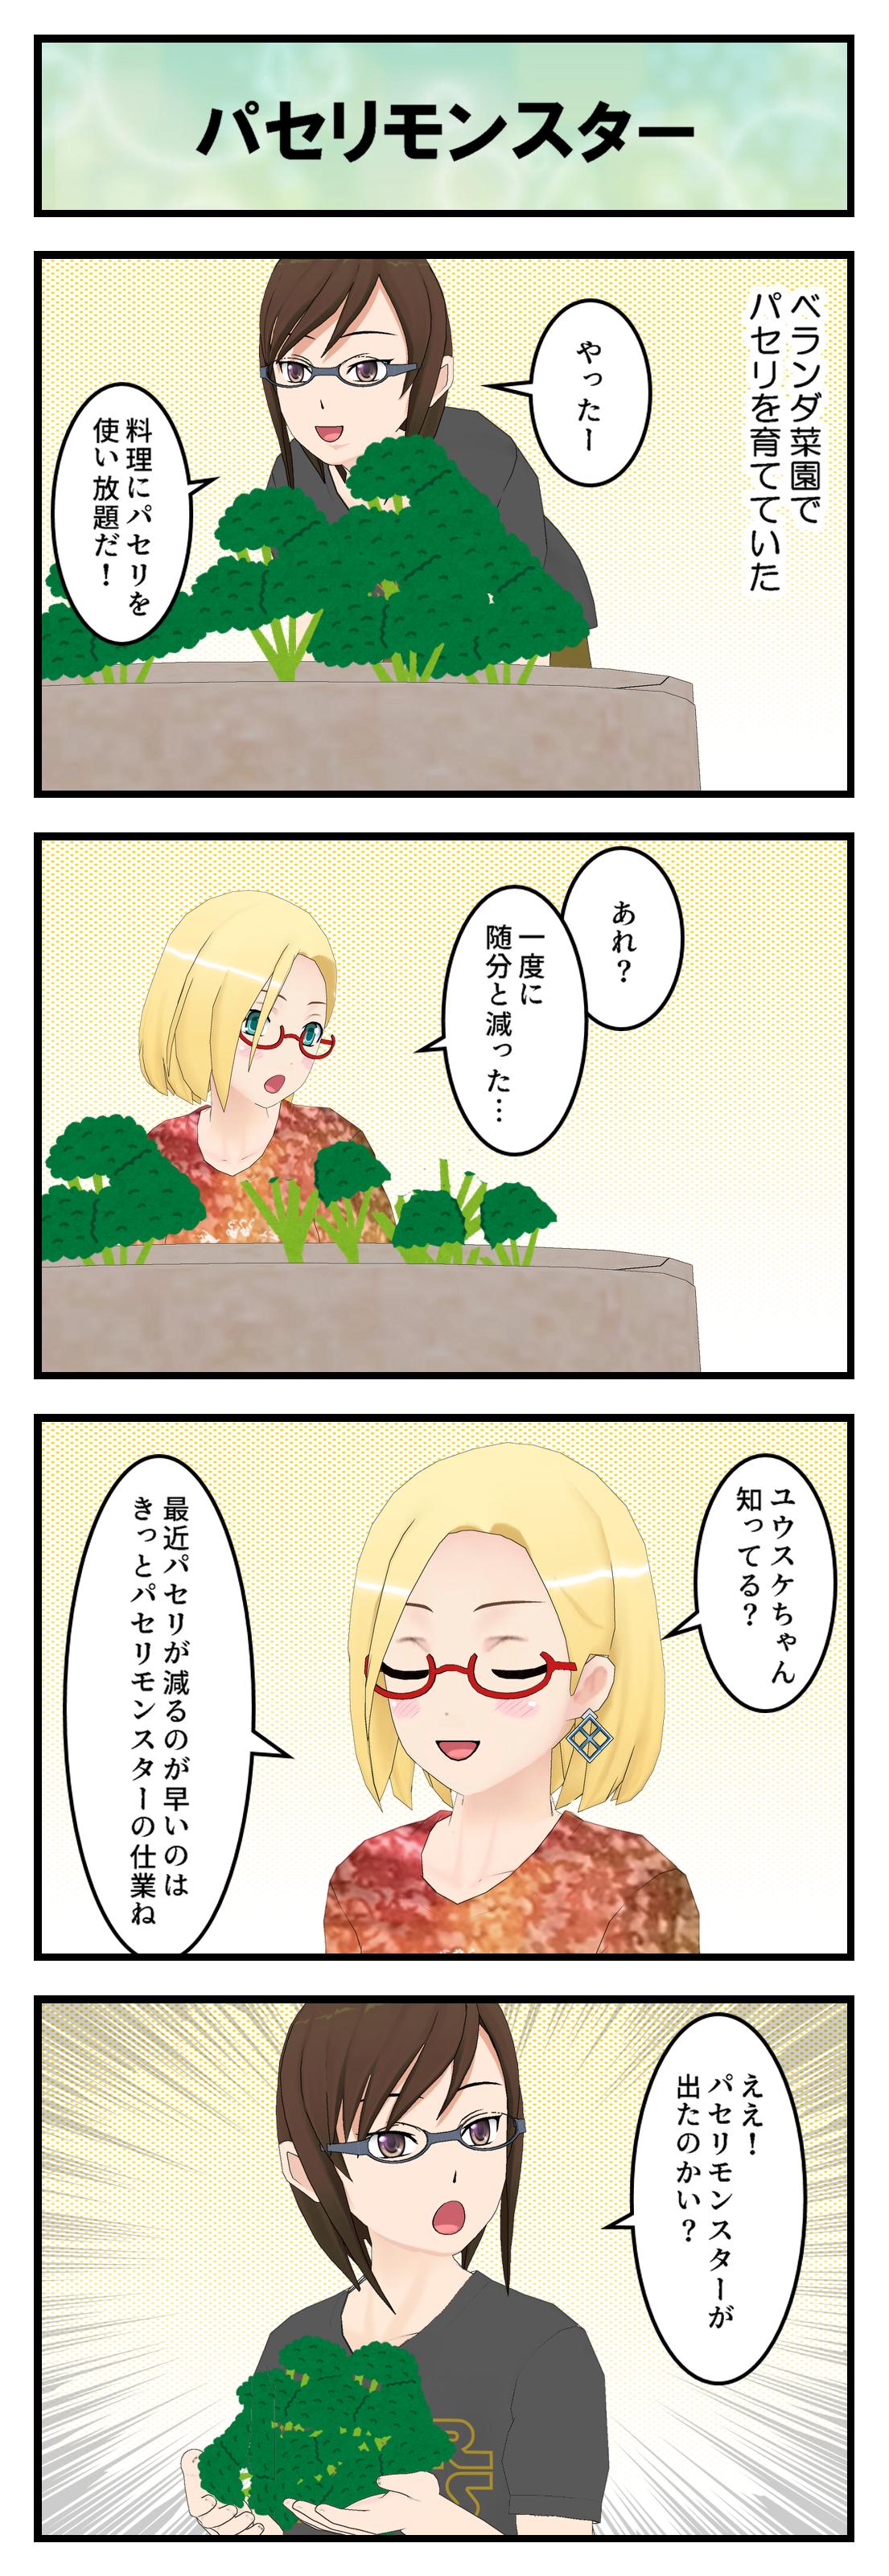 R650_パセリ食べ食べモンスター_001